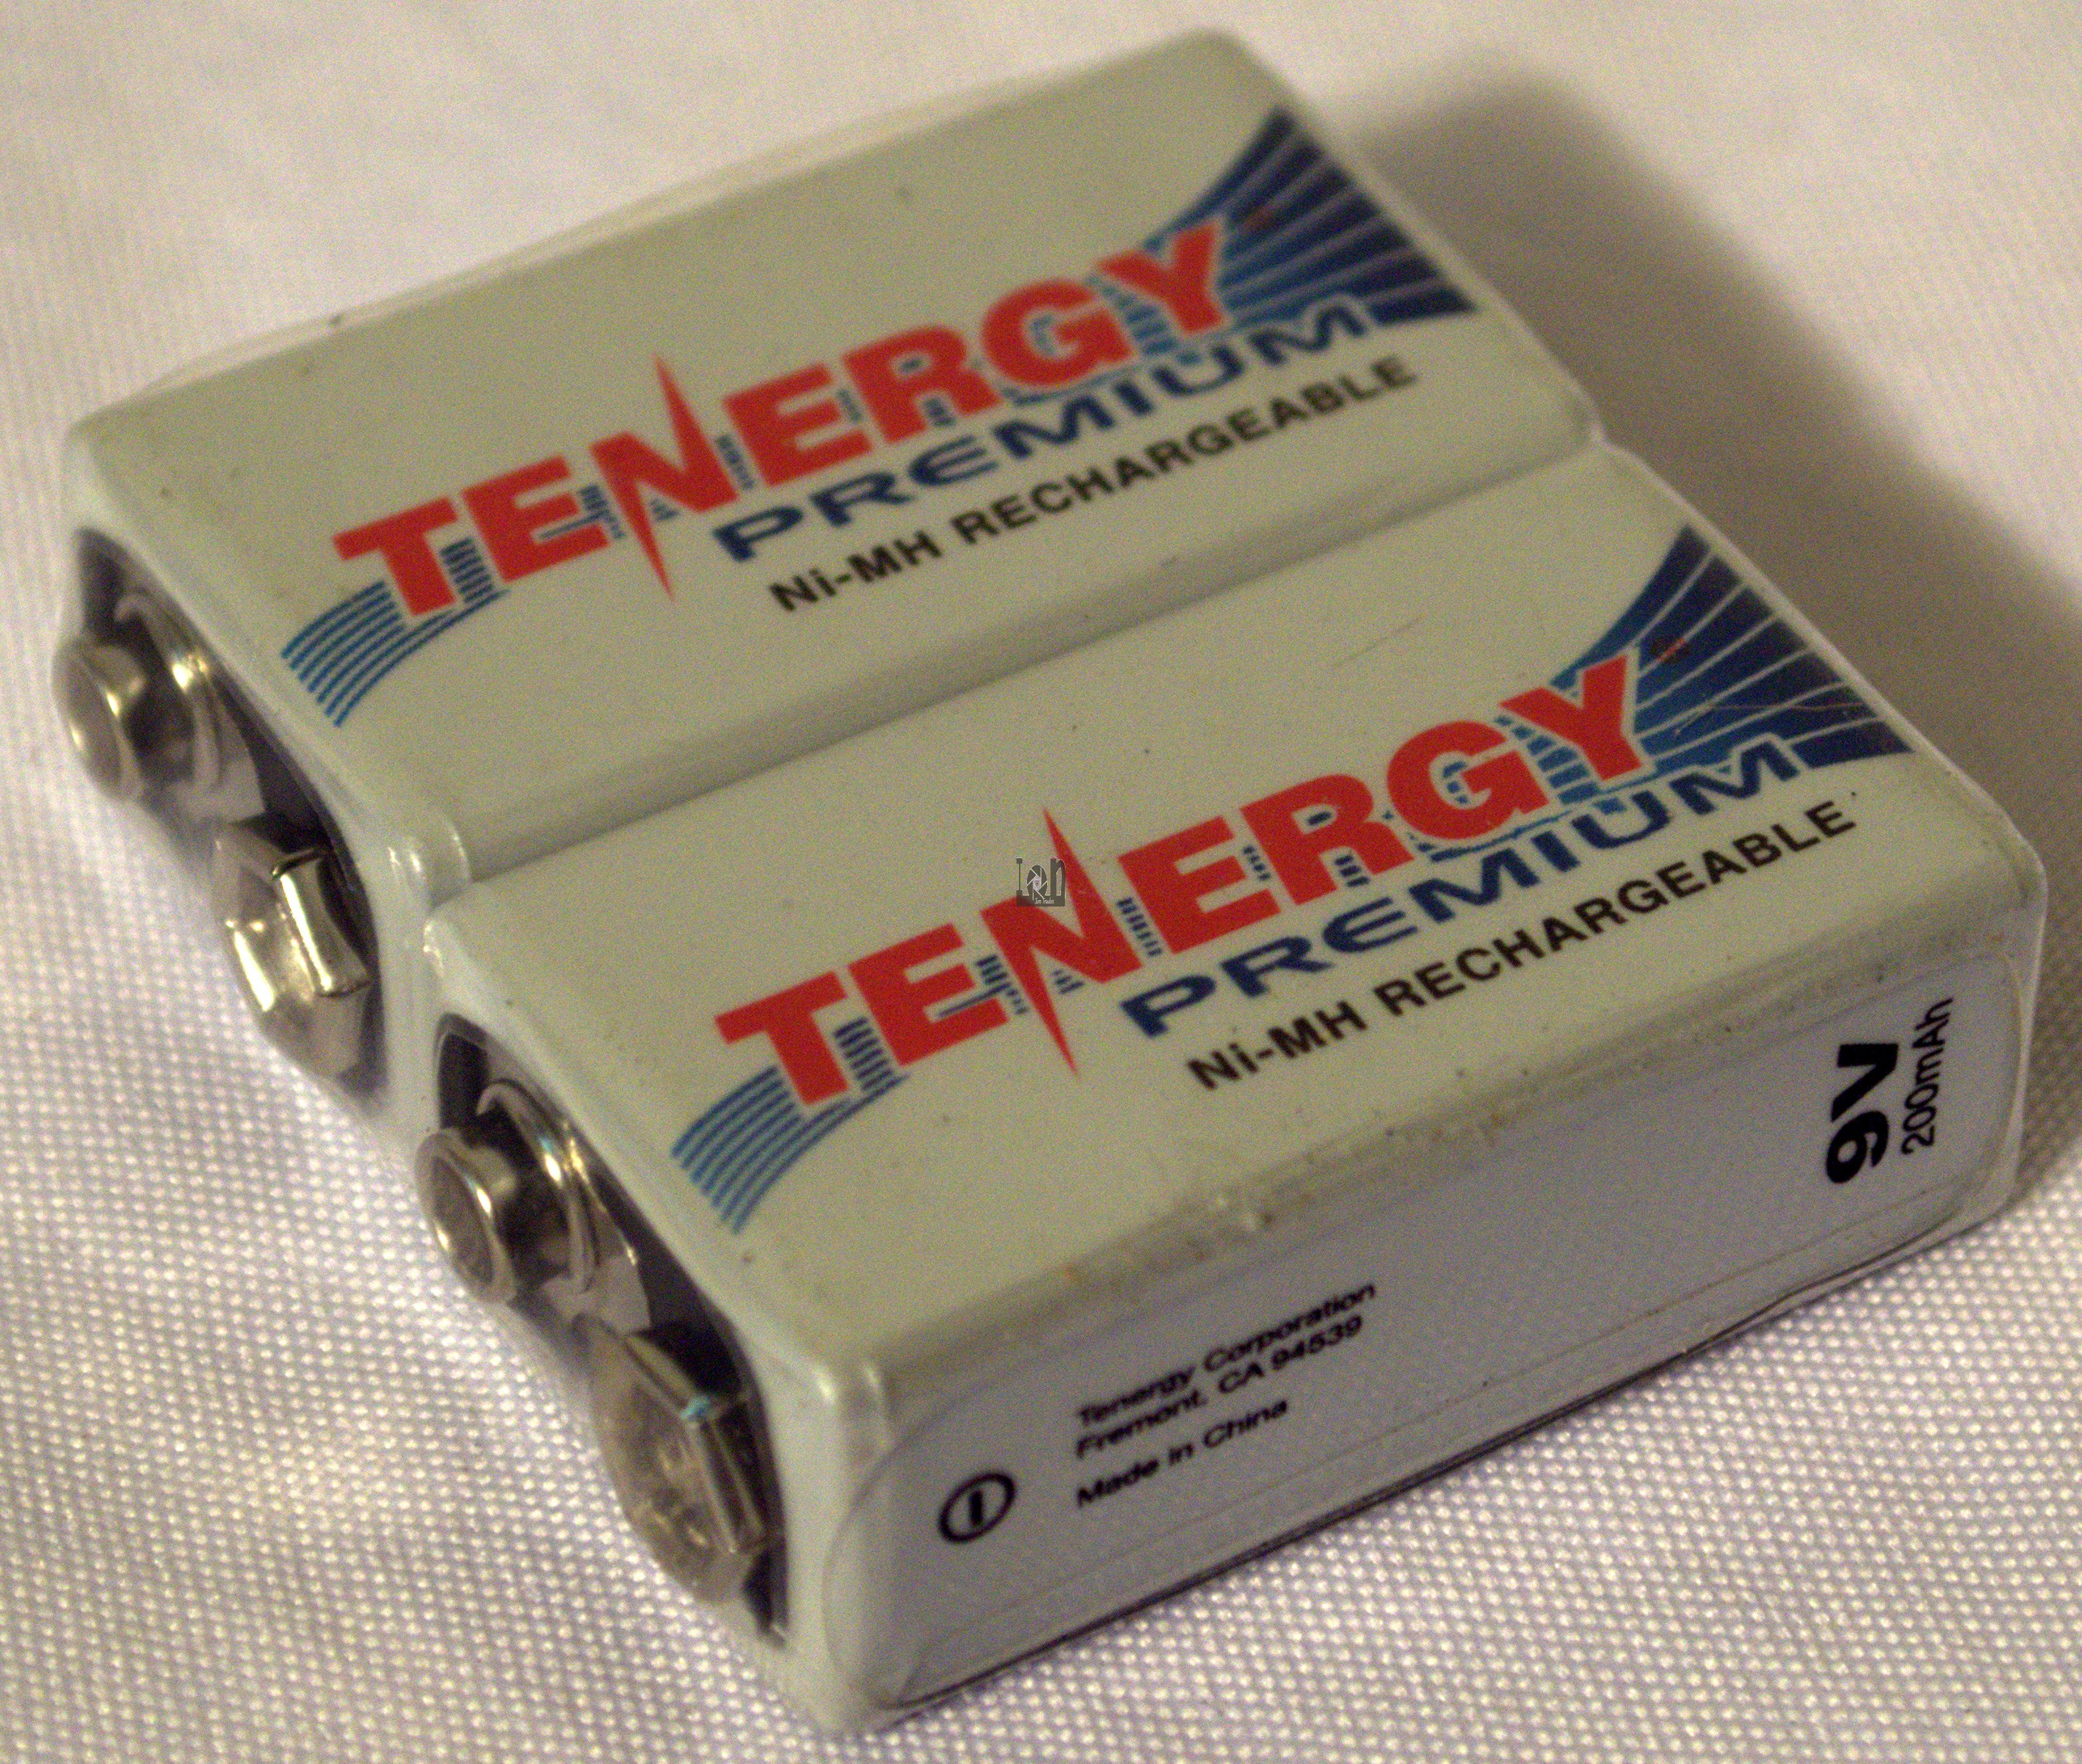 Tenergy Premium 9V Rechargeable Battery 2000mAh Ni-MH